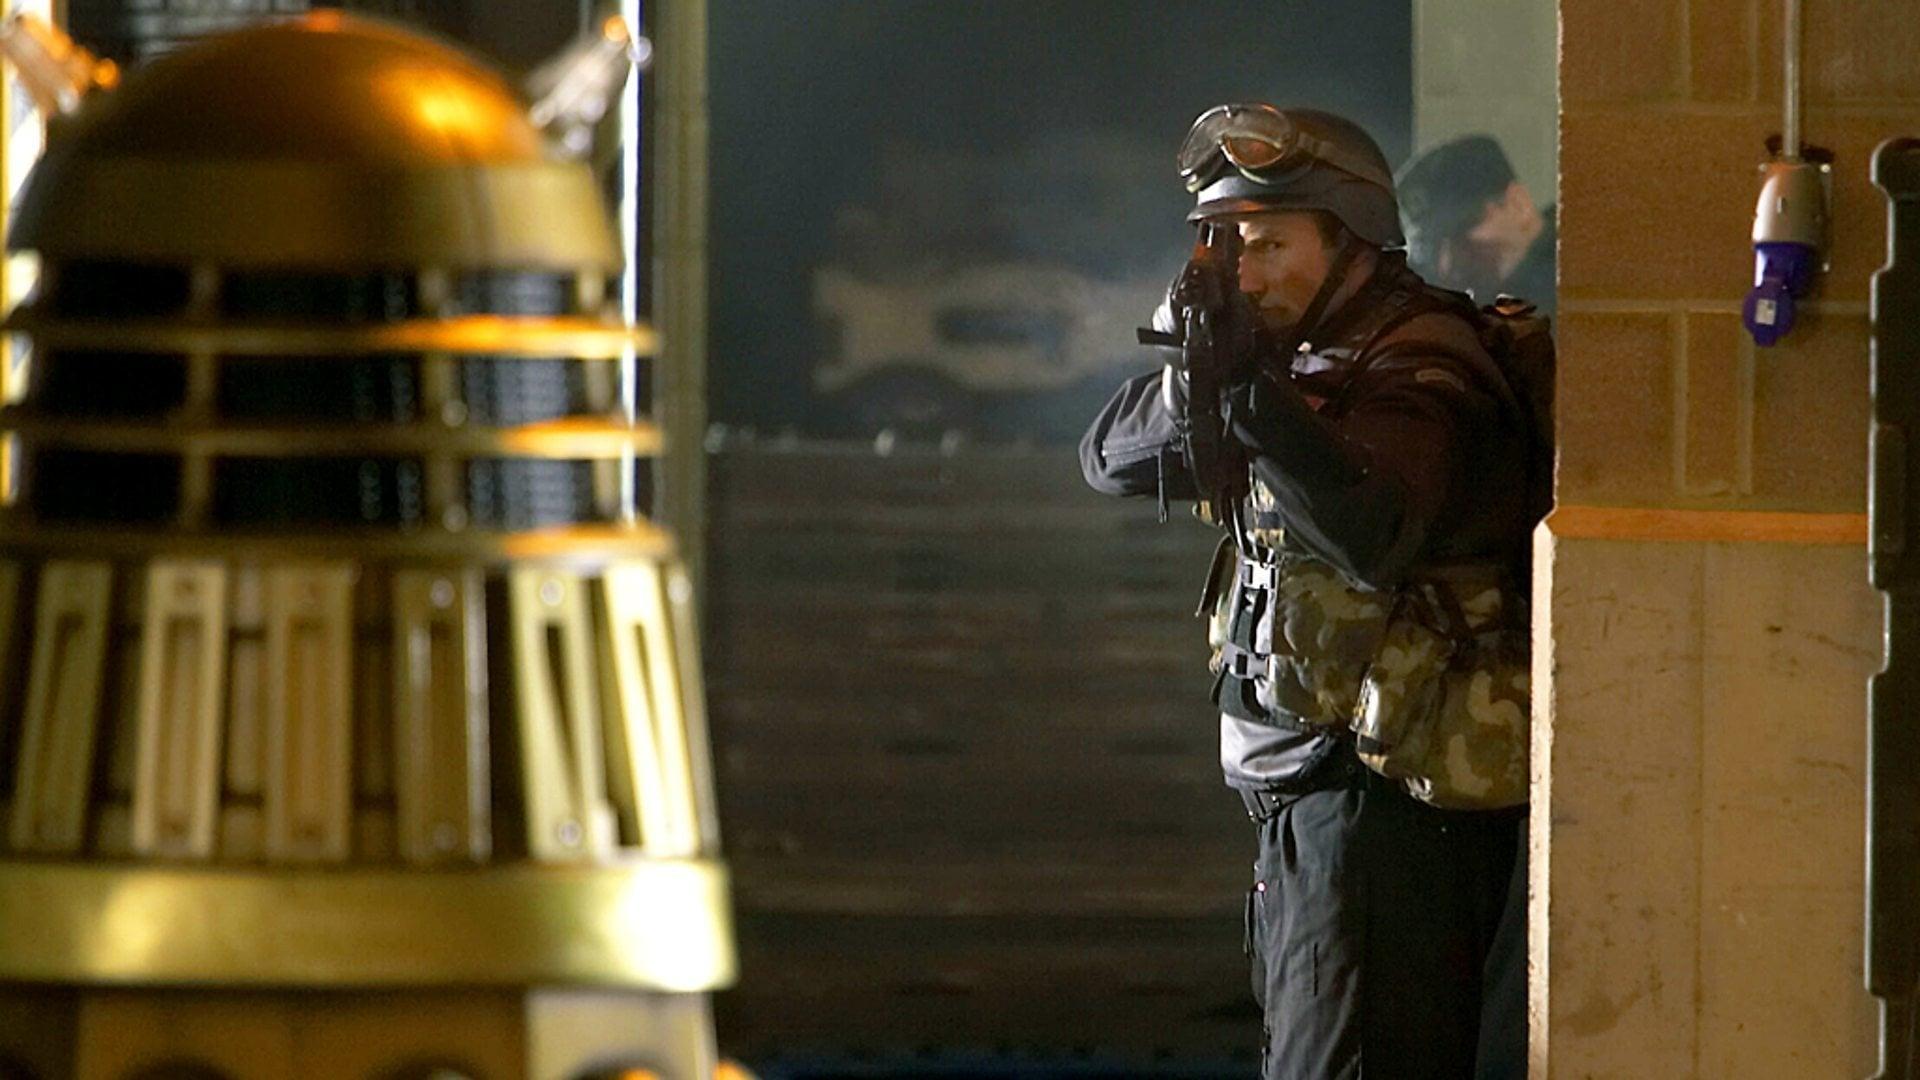 Doctor Who - Season 1 Episode 6 : Dalek